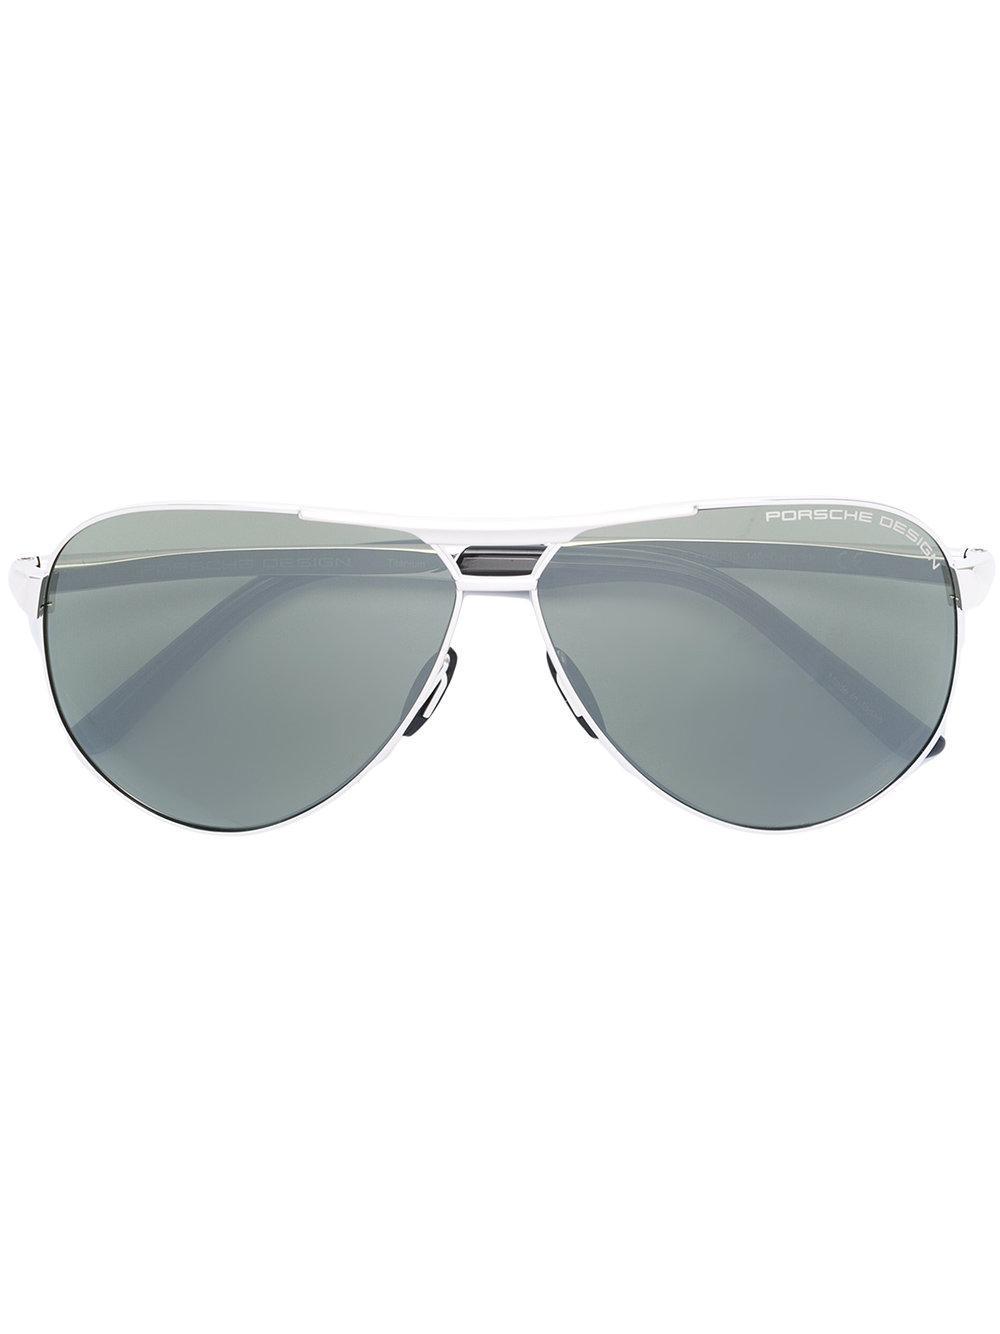 Porsche Design Aviator Sunglasses - Metallic